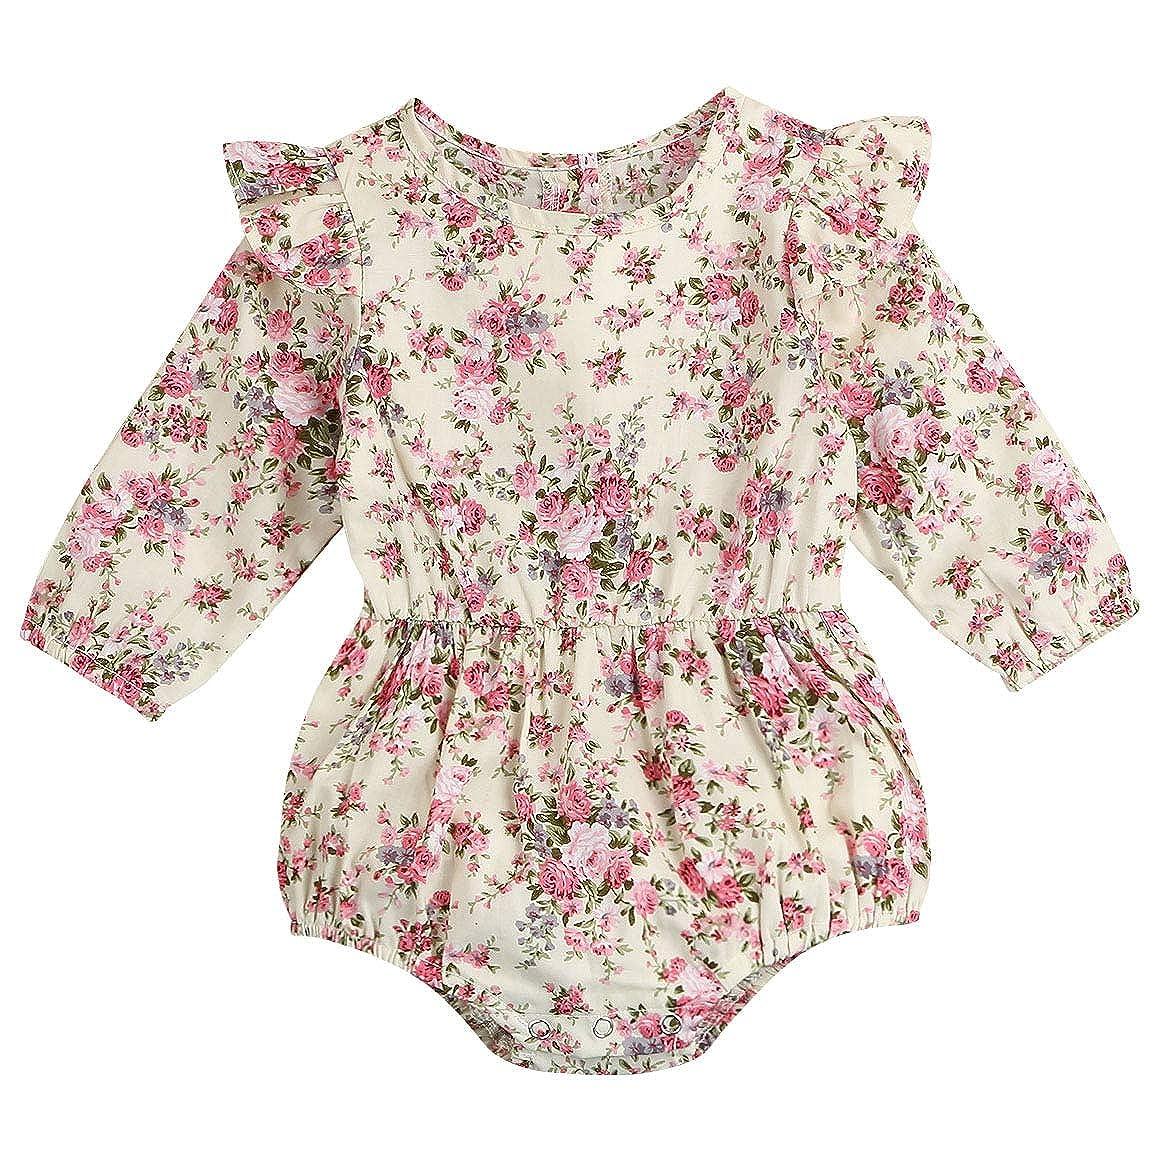 d5ecb78439de Amazon.com  Seven Young Newborn Baby Girls Floral Print Backless Romper  Infant Kids Jumpsuit Outfit Playsuit Clothes  Clothing